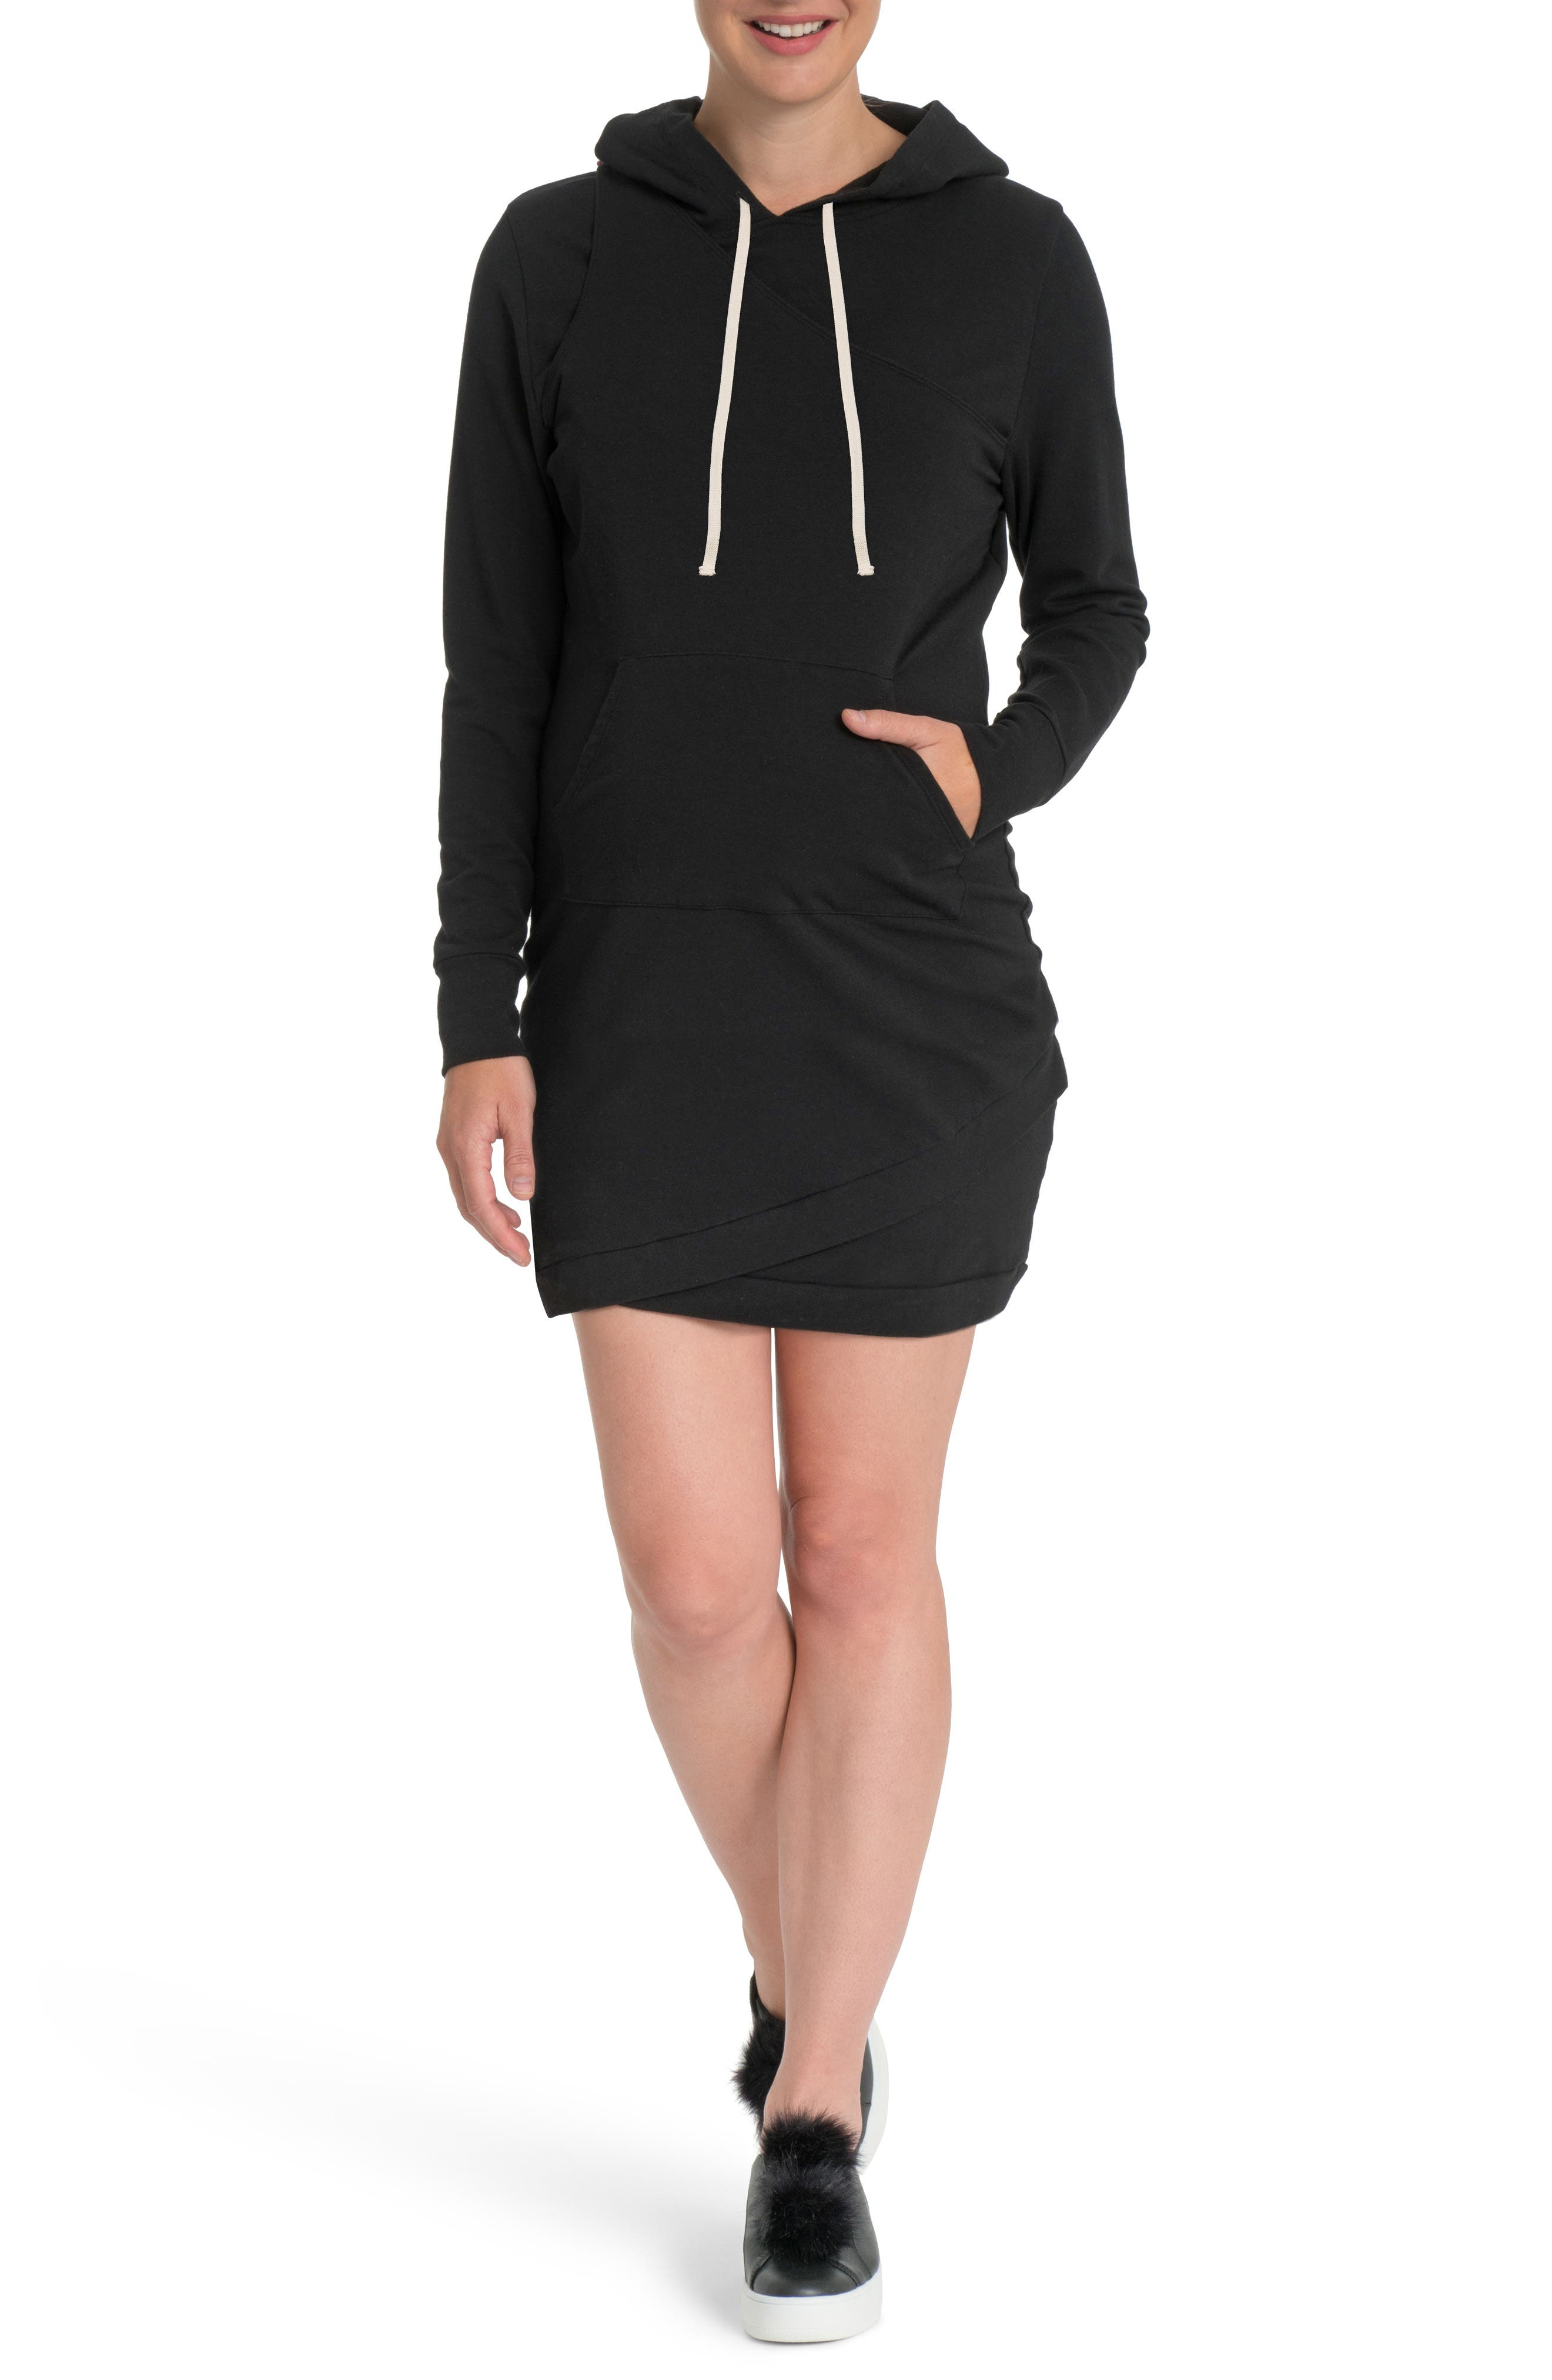 Cozy Maternity/Nursing Hooded Dress,                         Main,                         color, BLACK